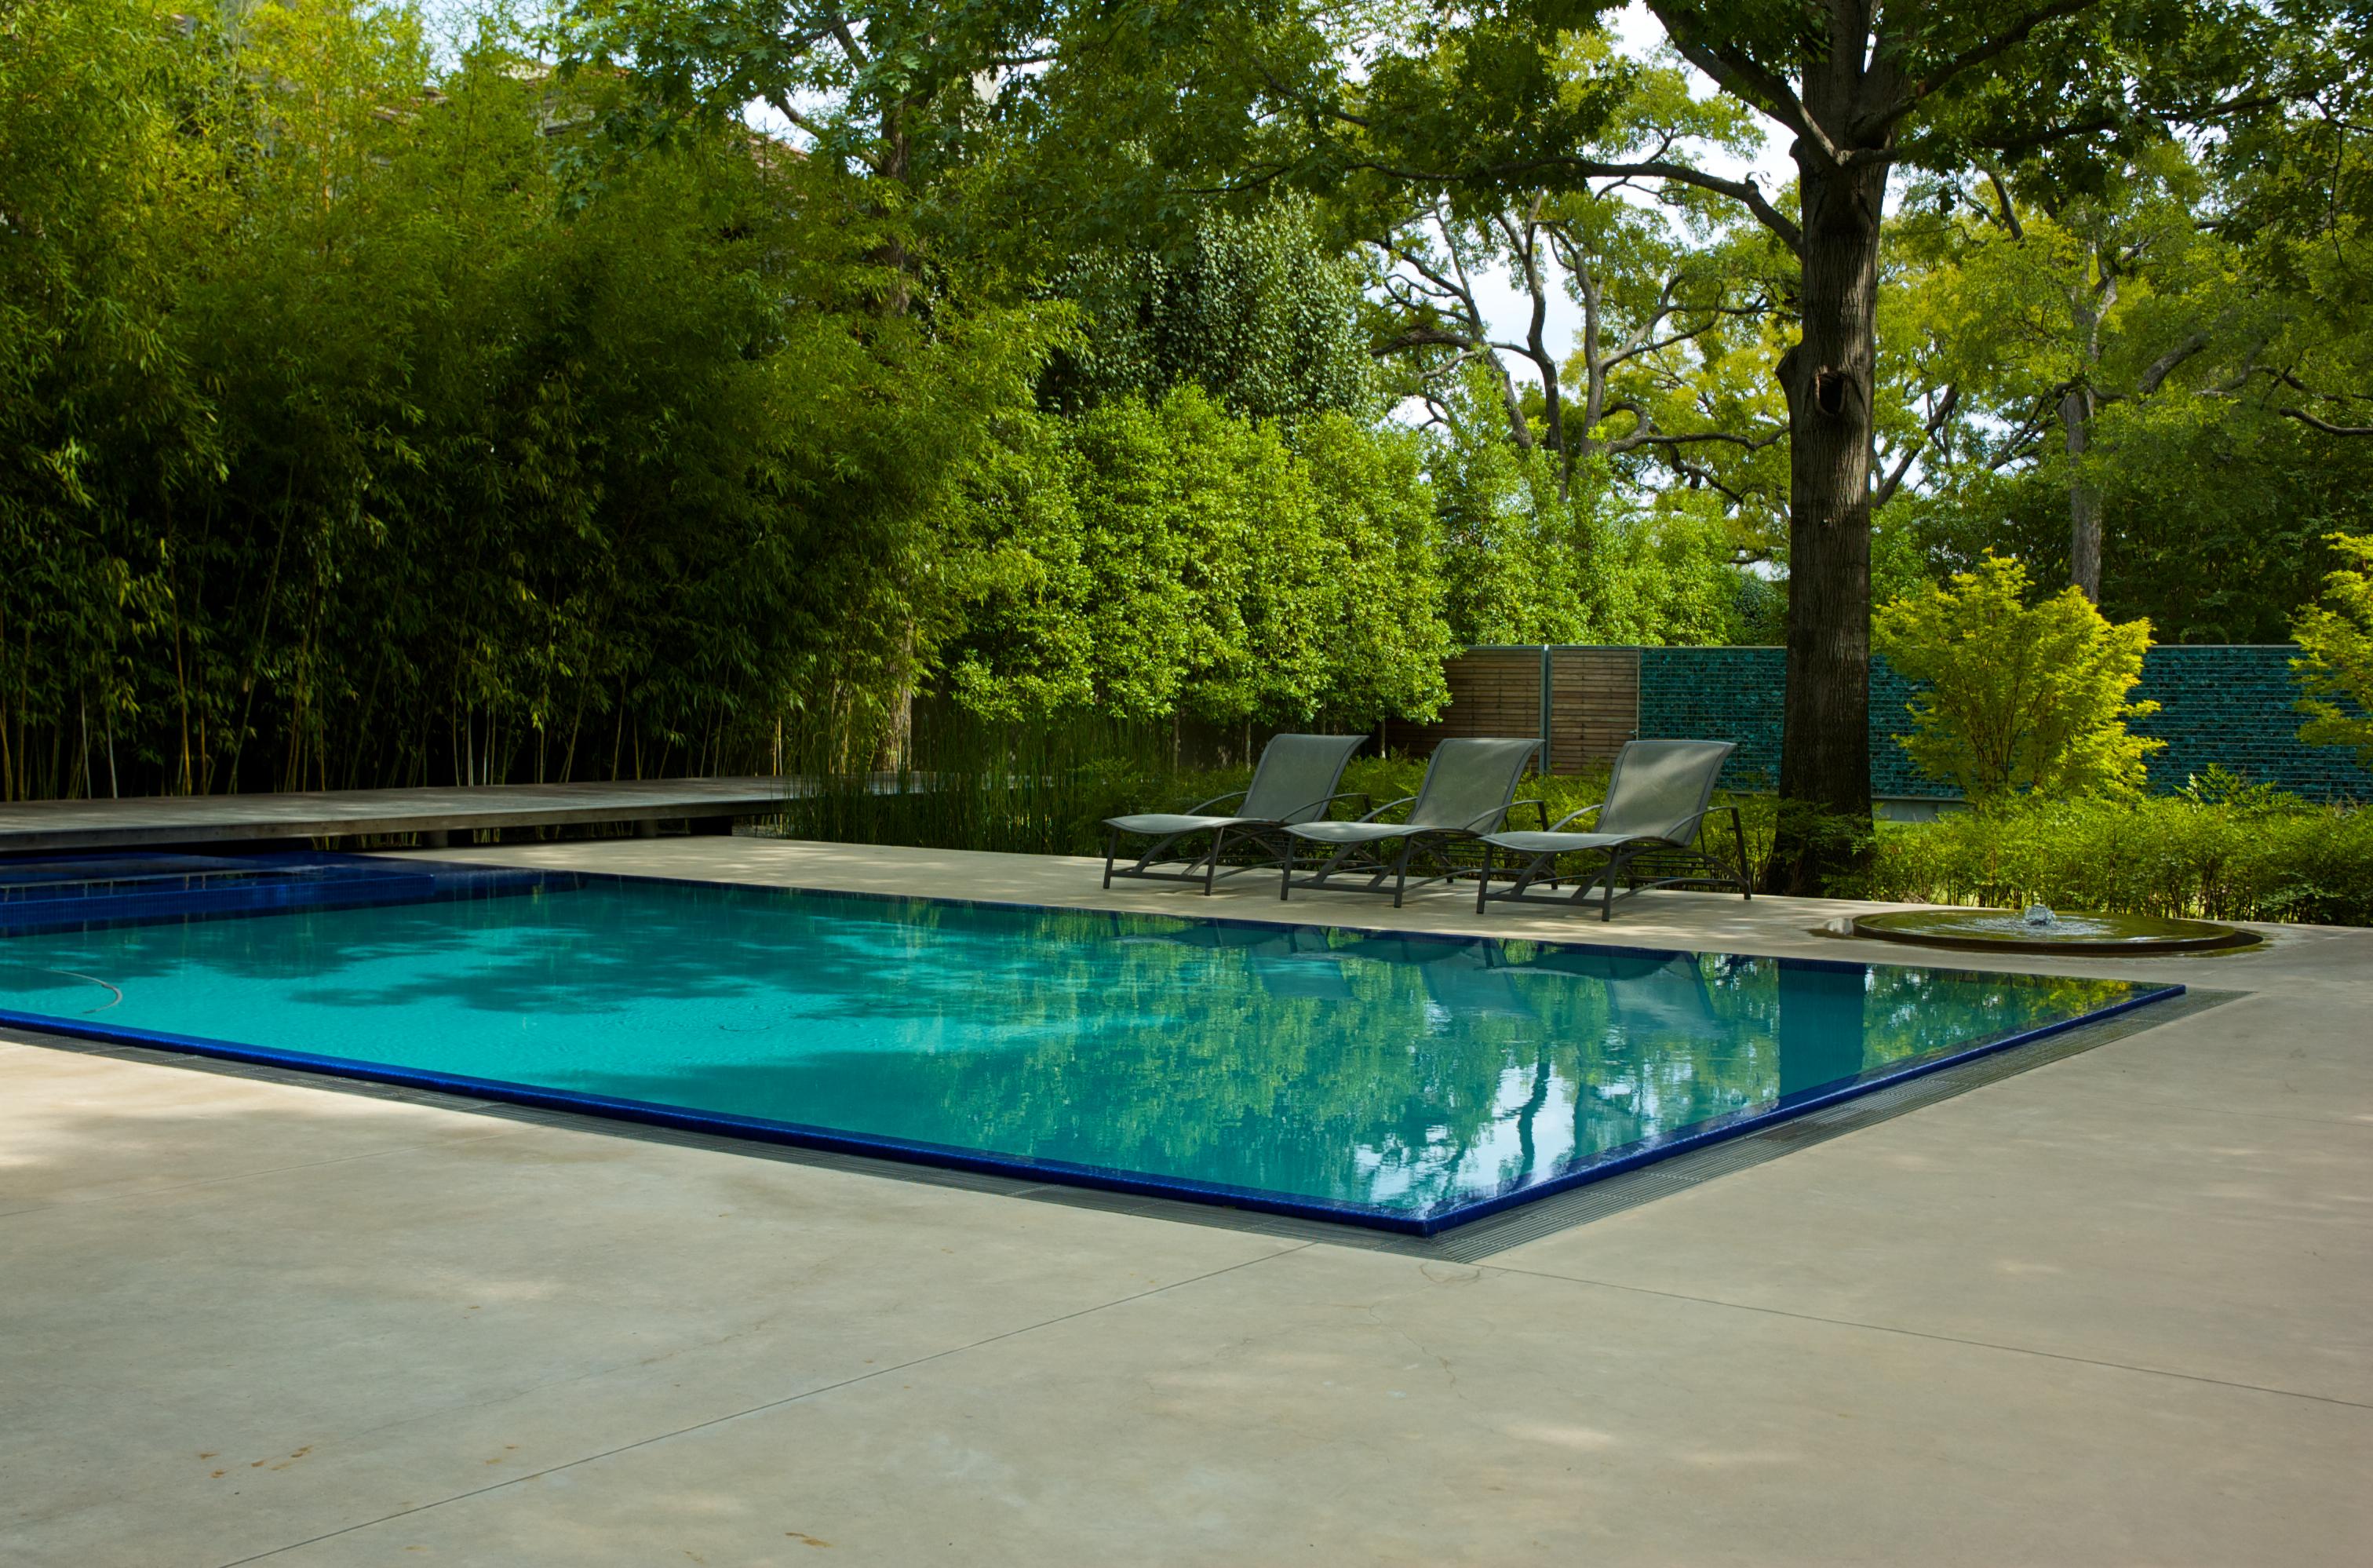 ASLA 2010 Professional Awards | The Pool House